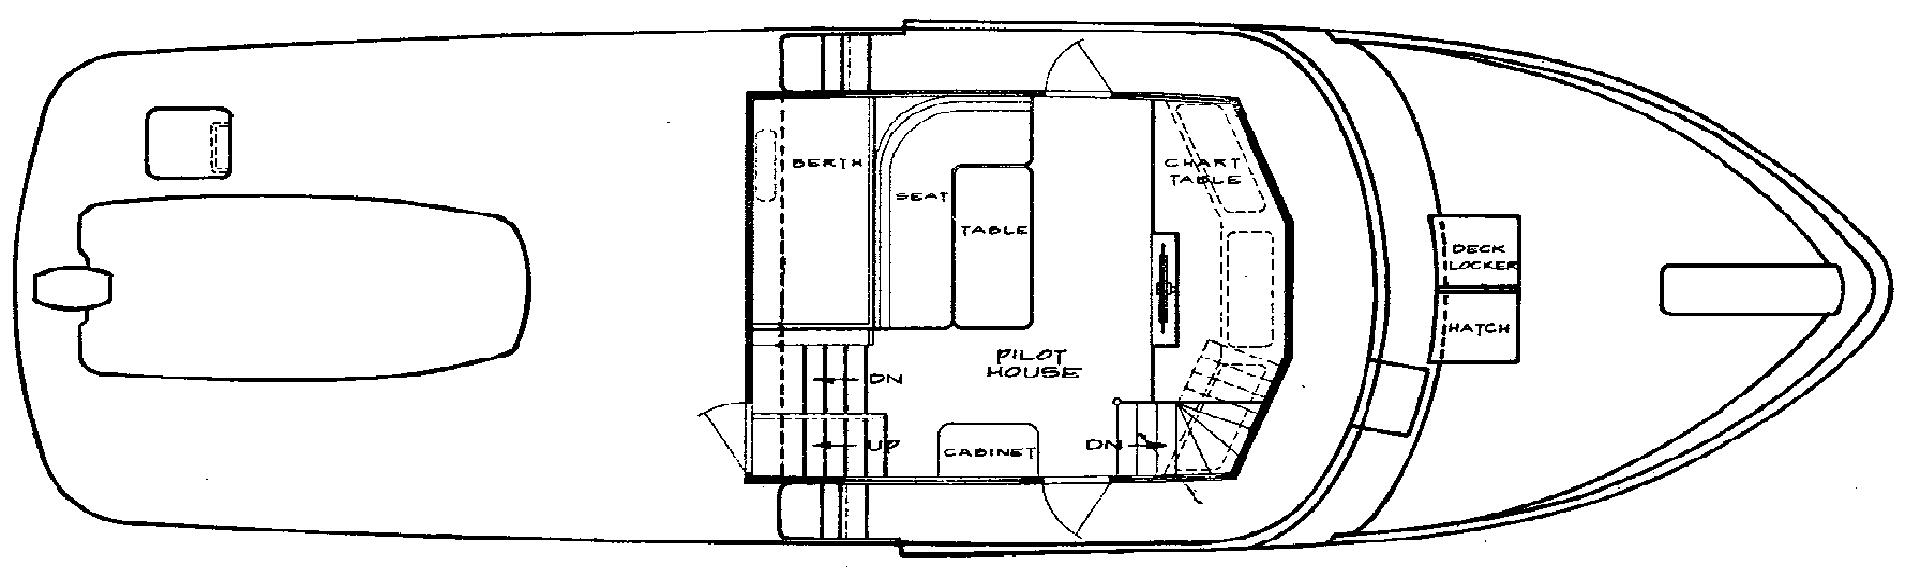 49 Pilothouse (Soft Chine) Floor Plan 2